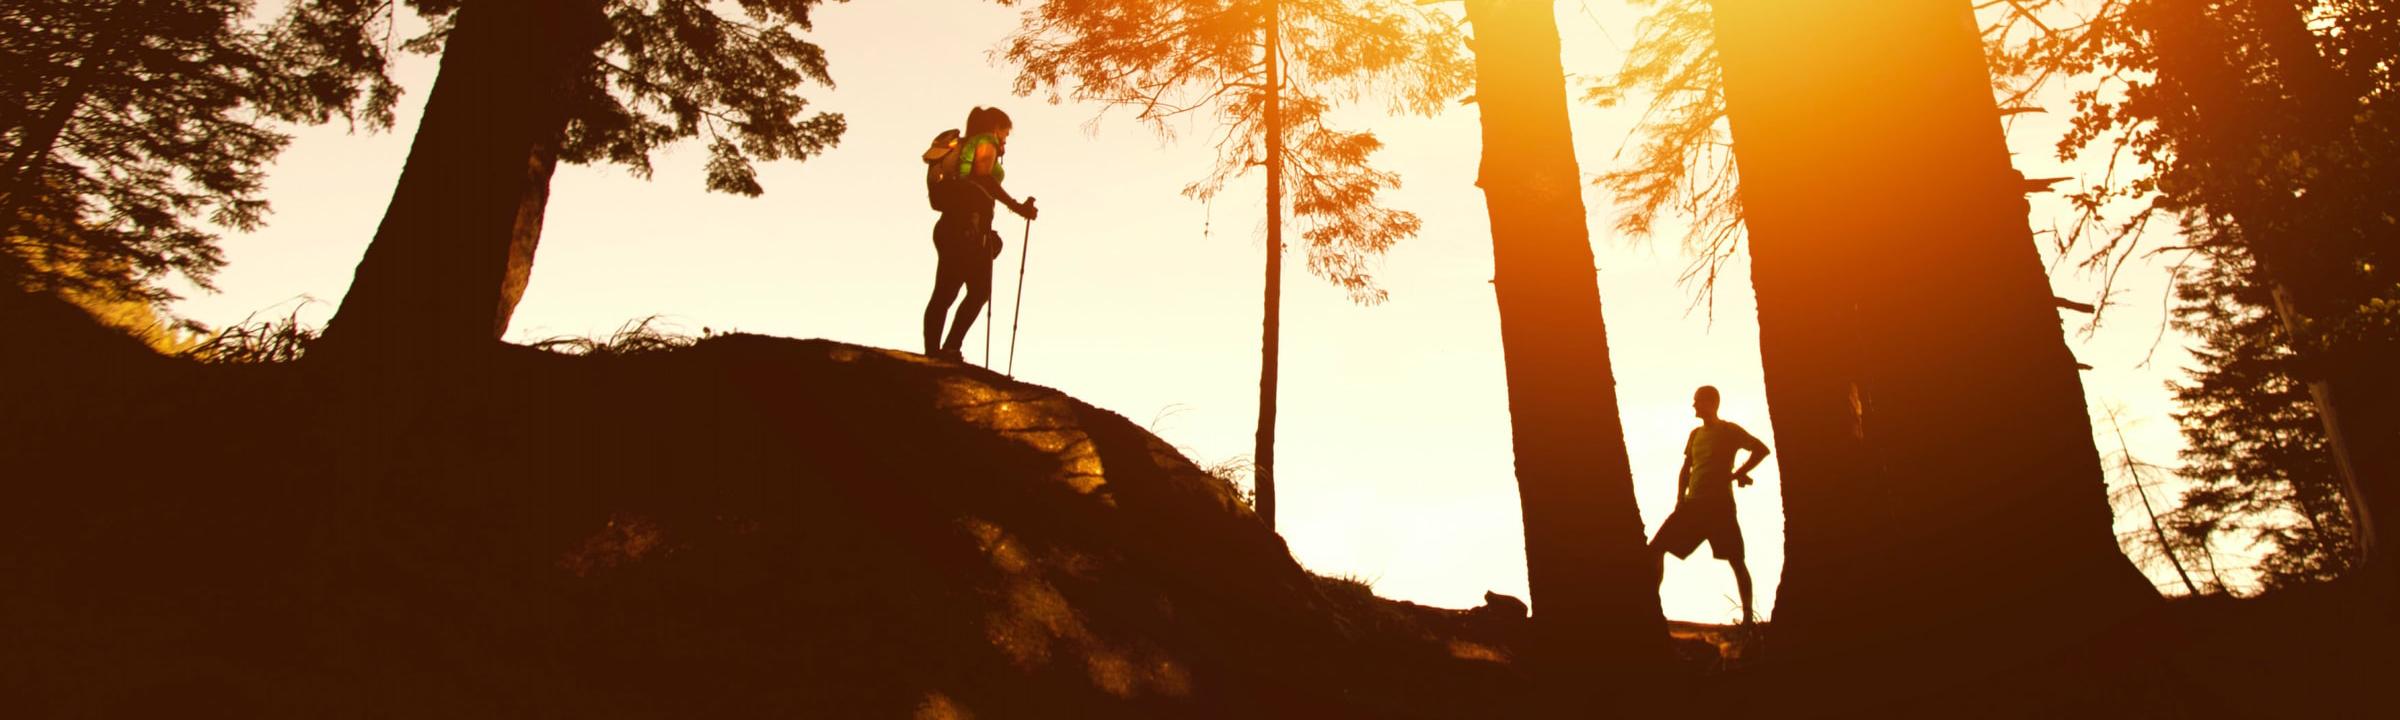 A couple hiking on a ridge at sunset.